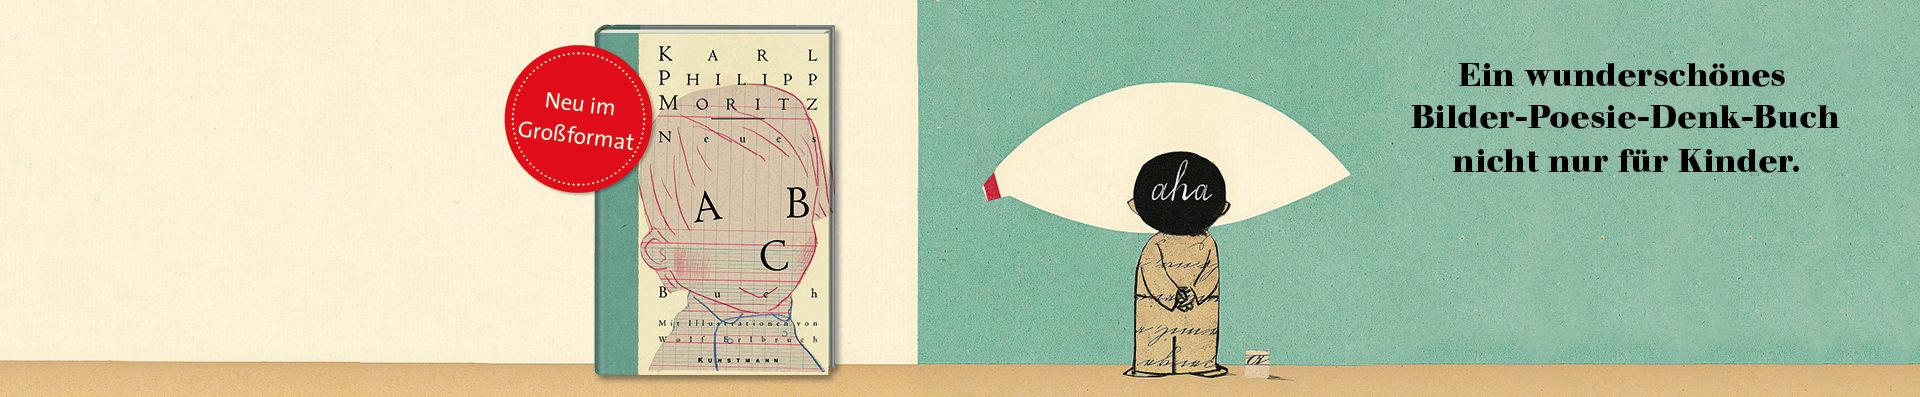 Erlbruch | Moritz – neues ABC-Buch